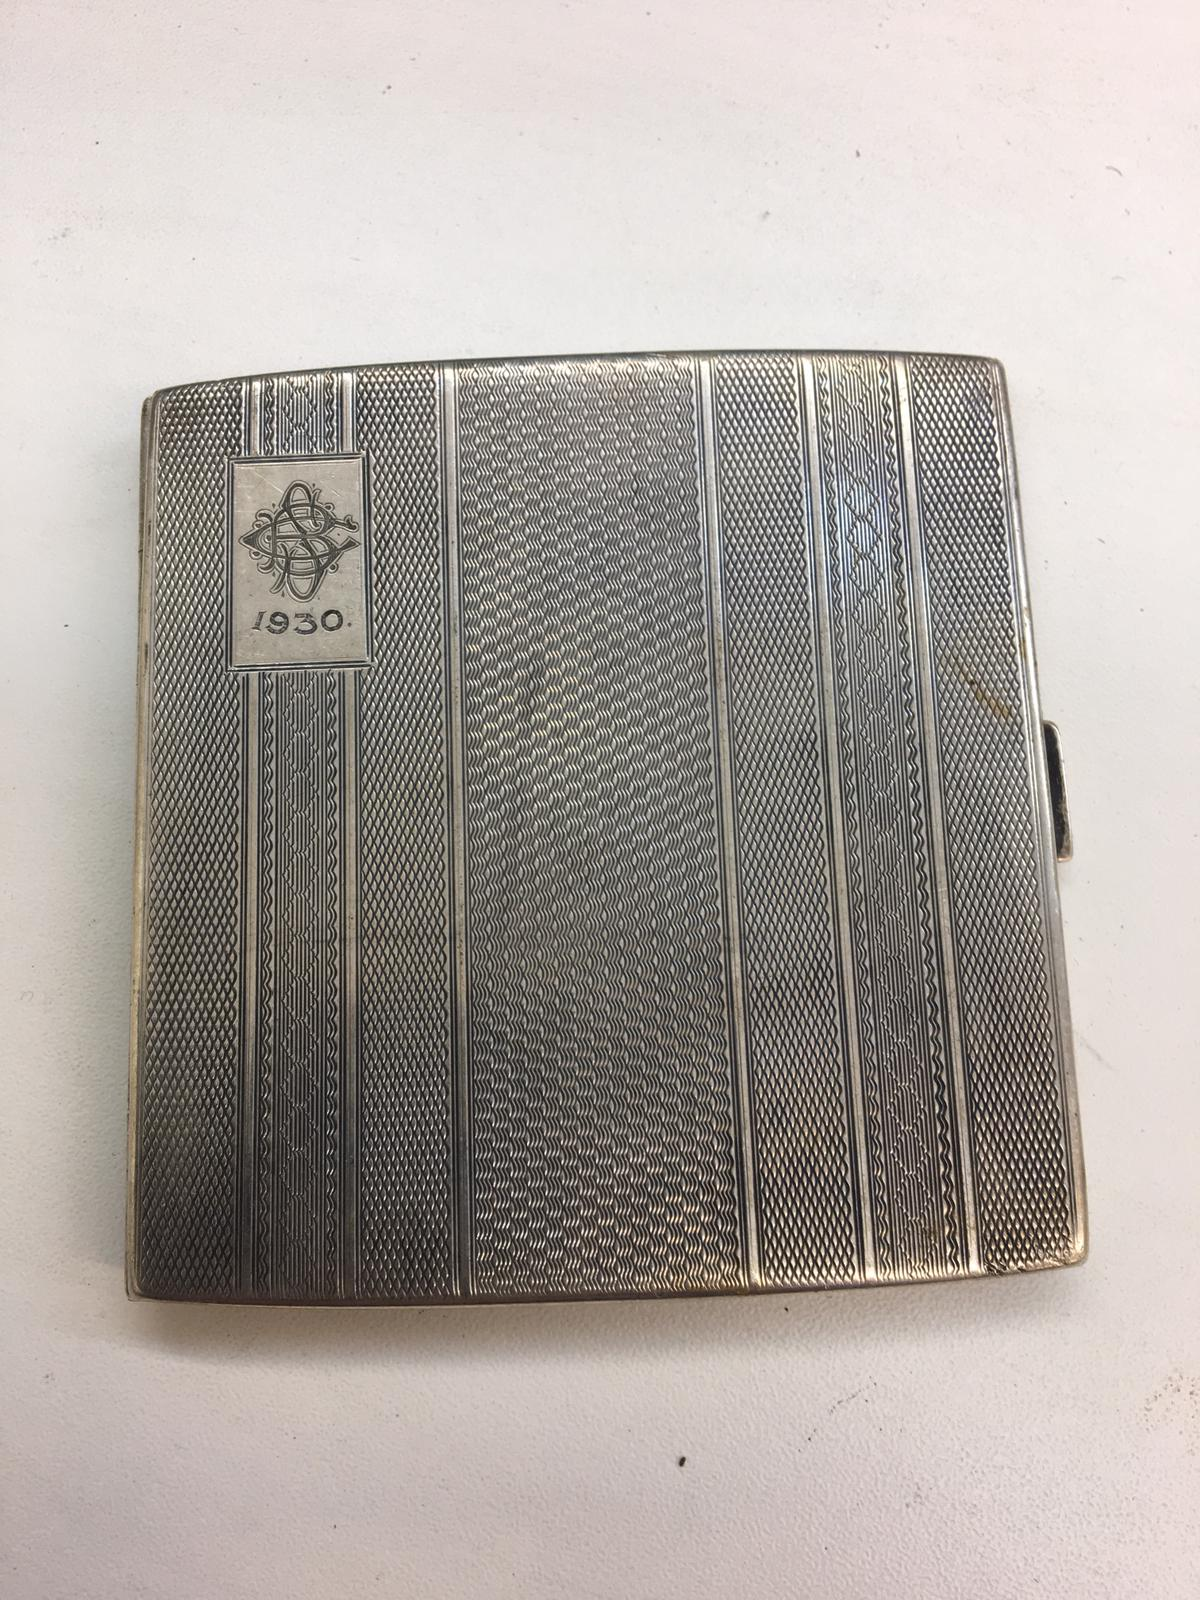 Lot 13 - HM Silver cigarette case weight 116g